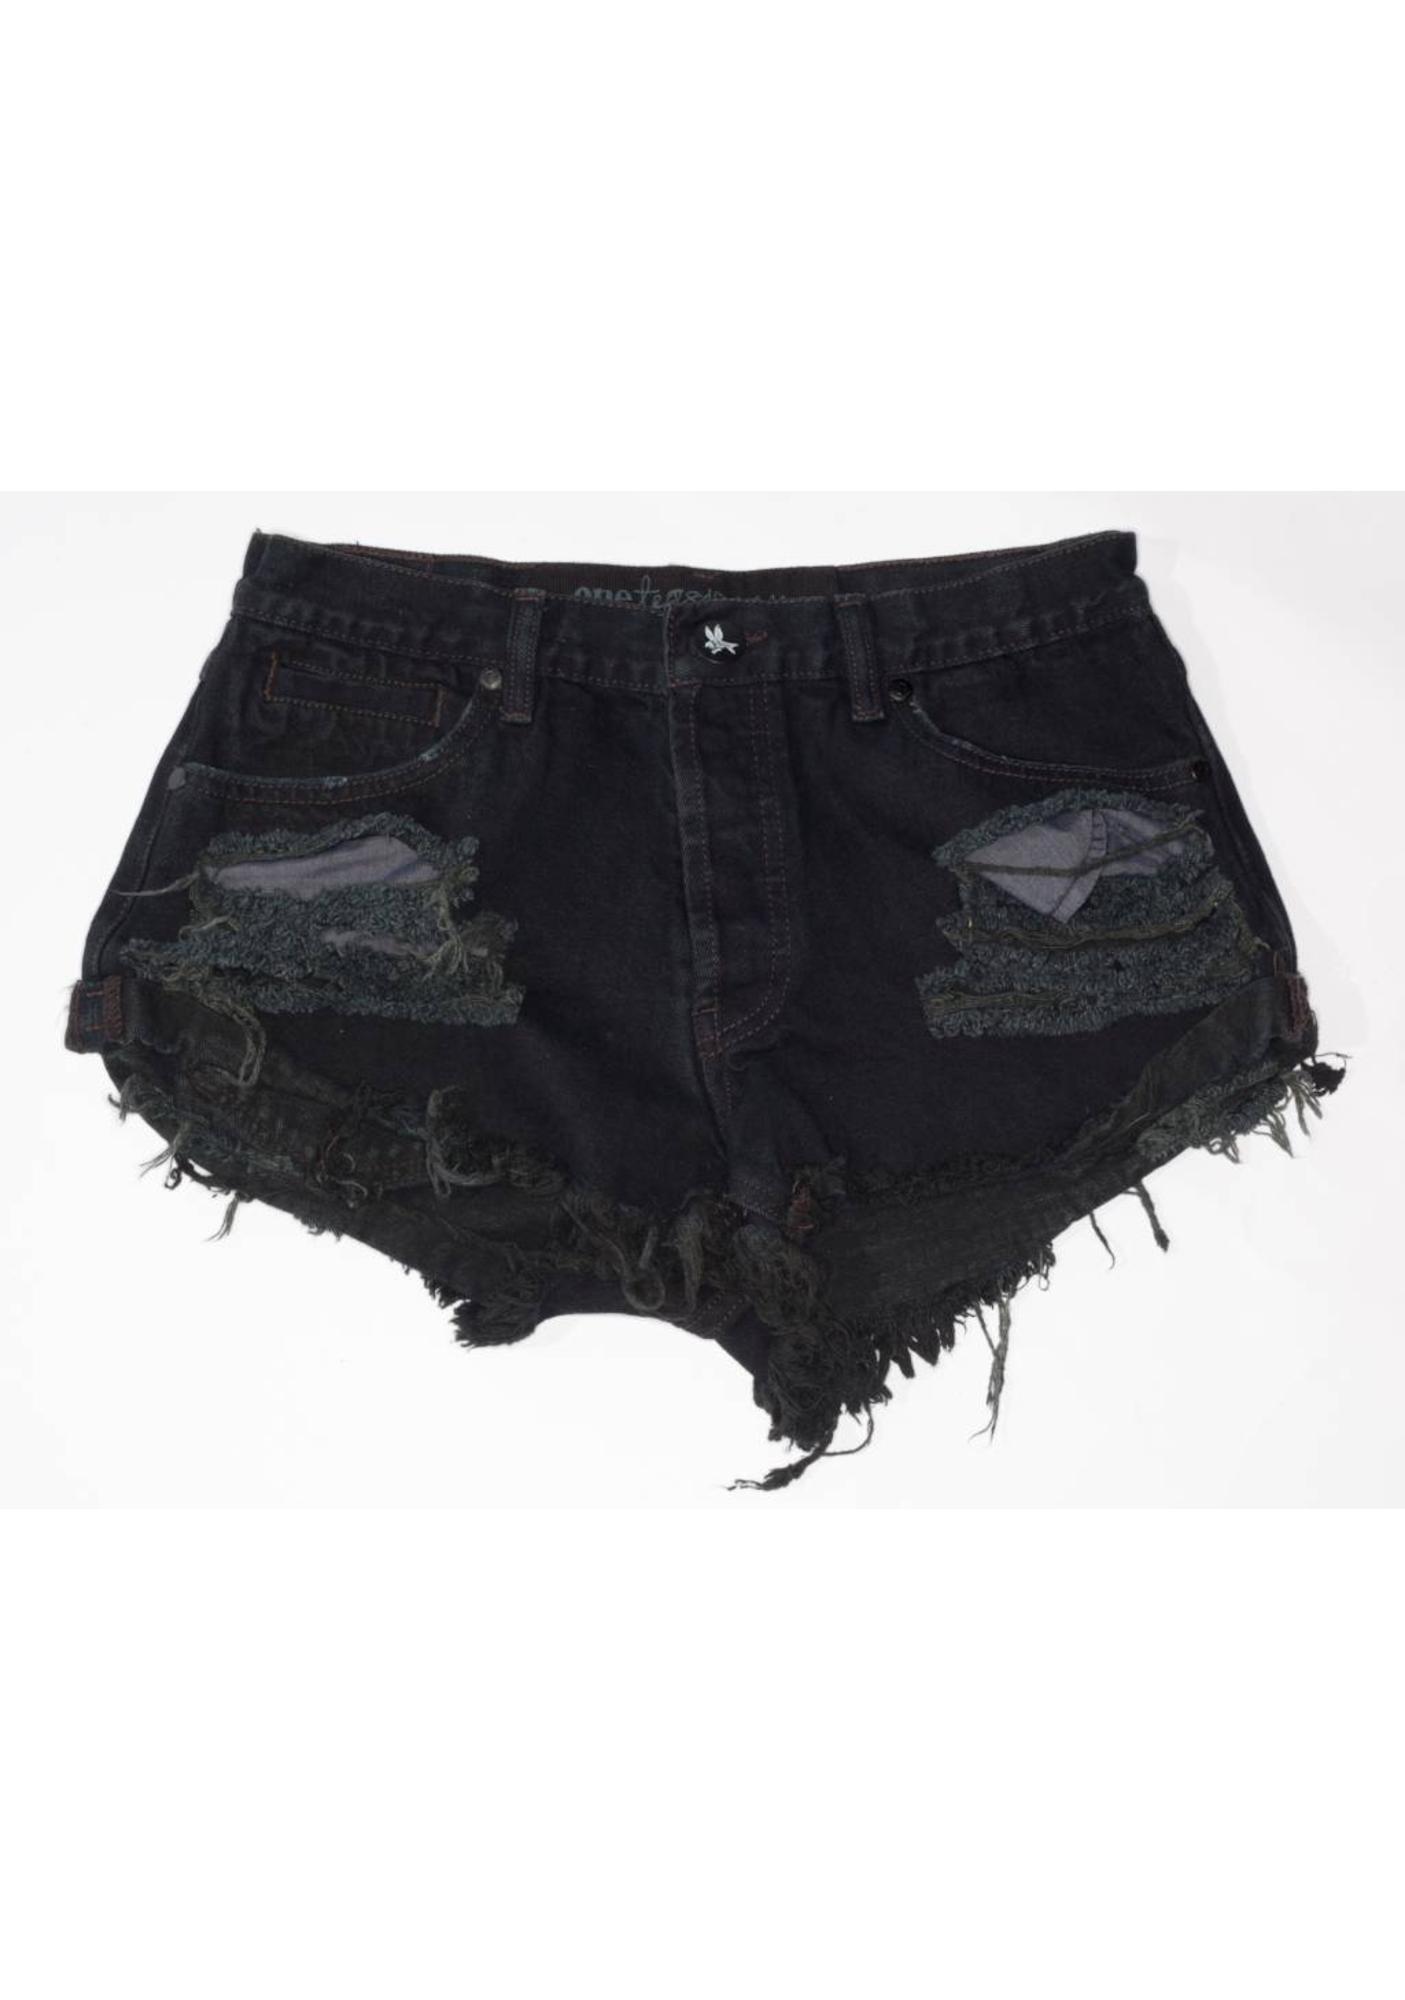 One Teaspoon Trashed Bandits Shorts